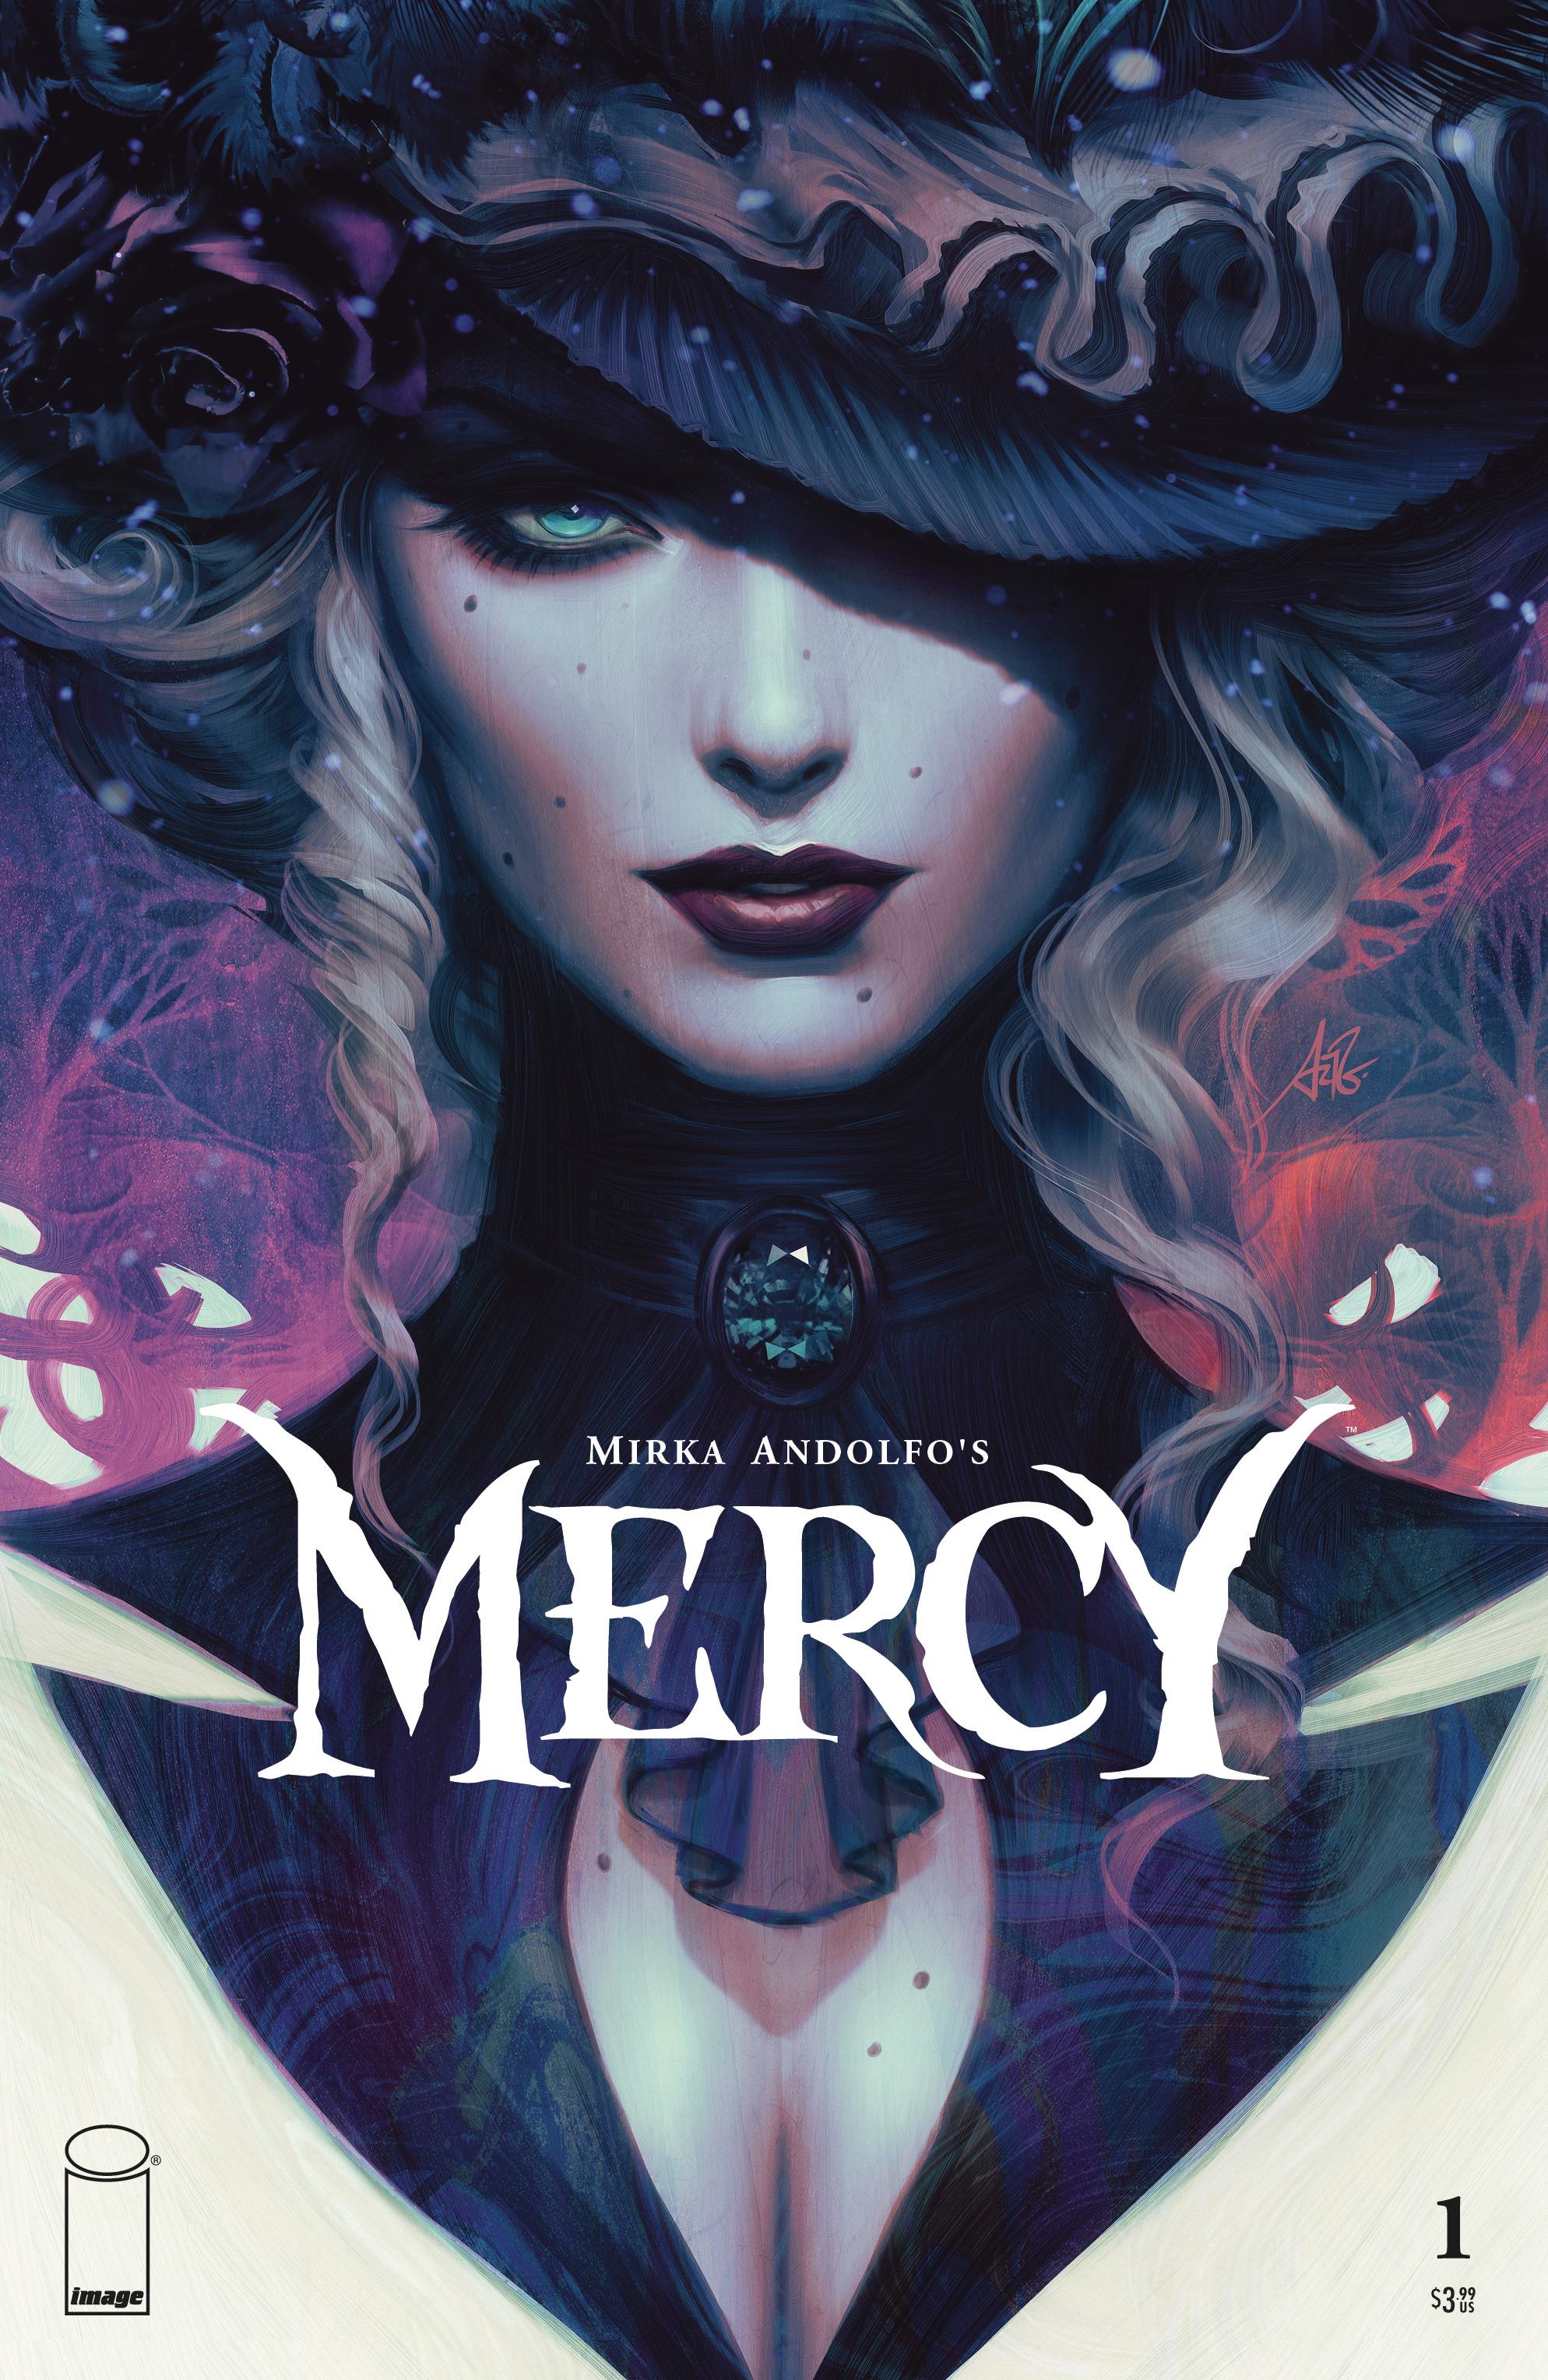 MIRKA ANDOLFO MERCY #1 CVR C ARTGERM (MR)